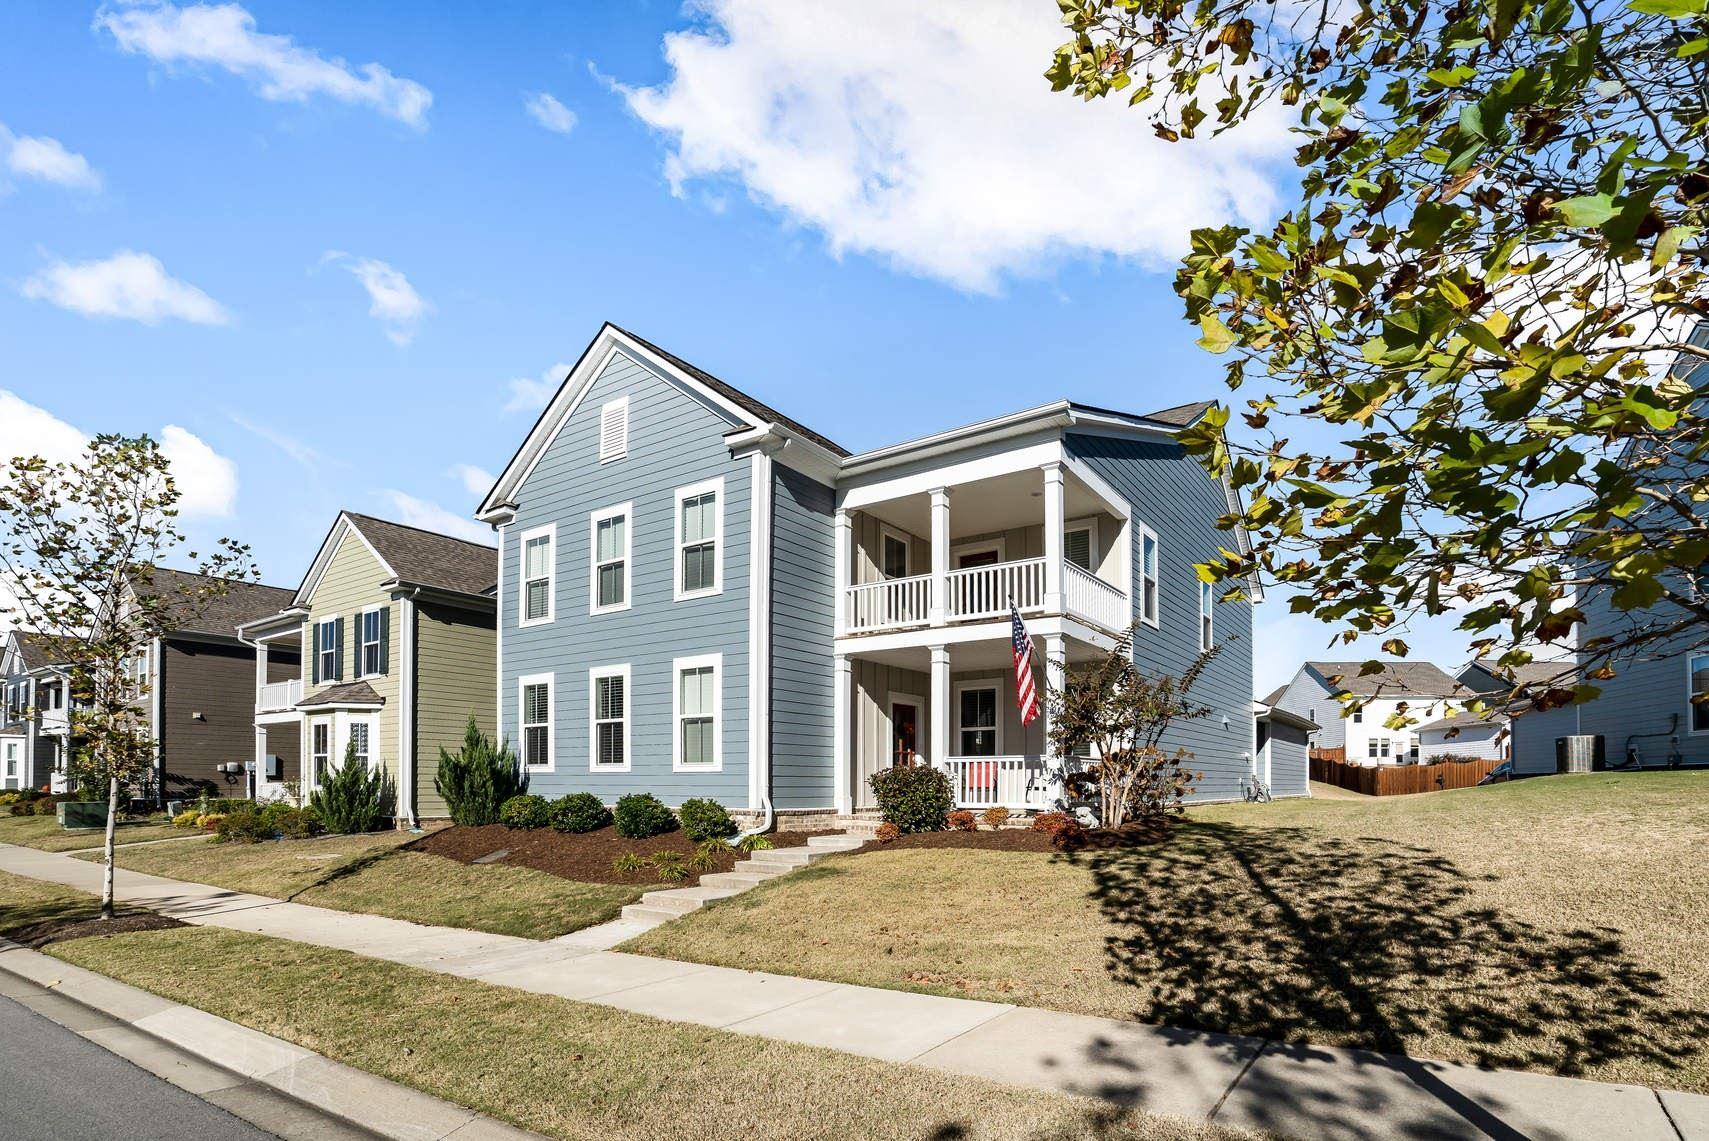 Photo of 1451 Casner Ln, Franklin, TN 37067 (MLS # 2205237)